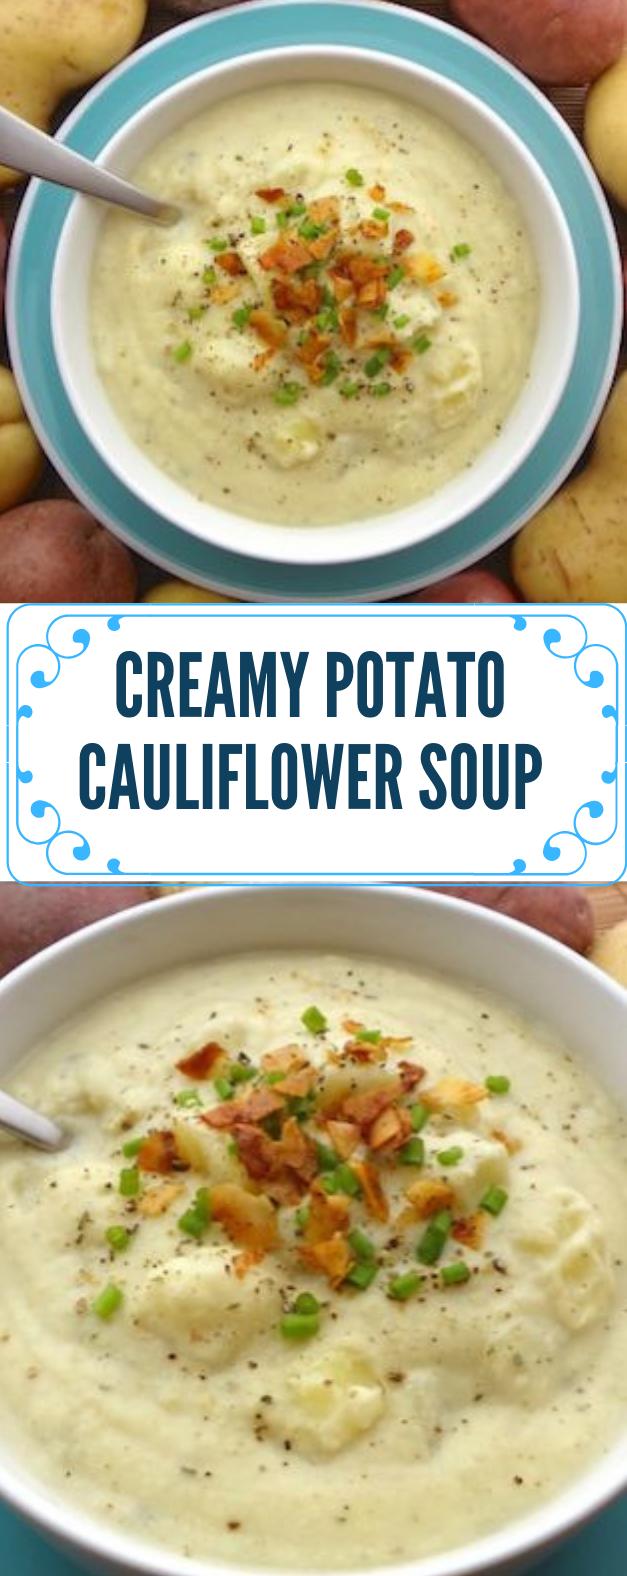 CREAMY POTATO CAULIFLOWER SOUP (VEGAN) #dinner #healthyrecipe #potato